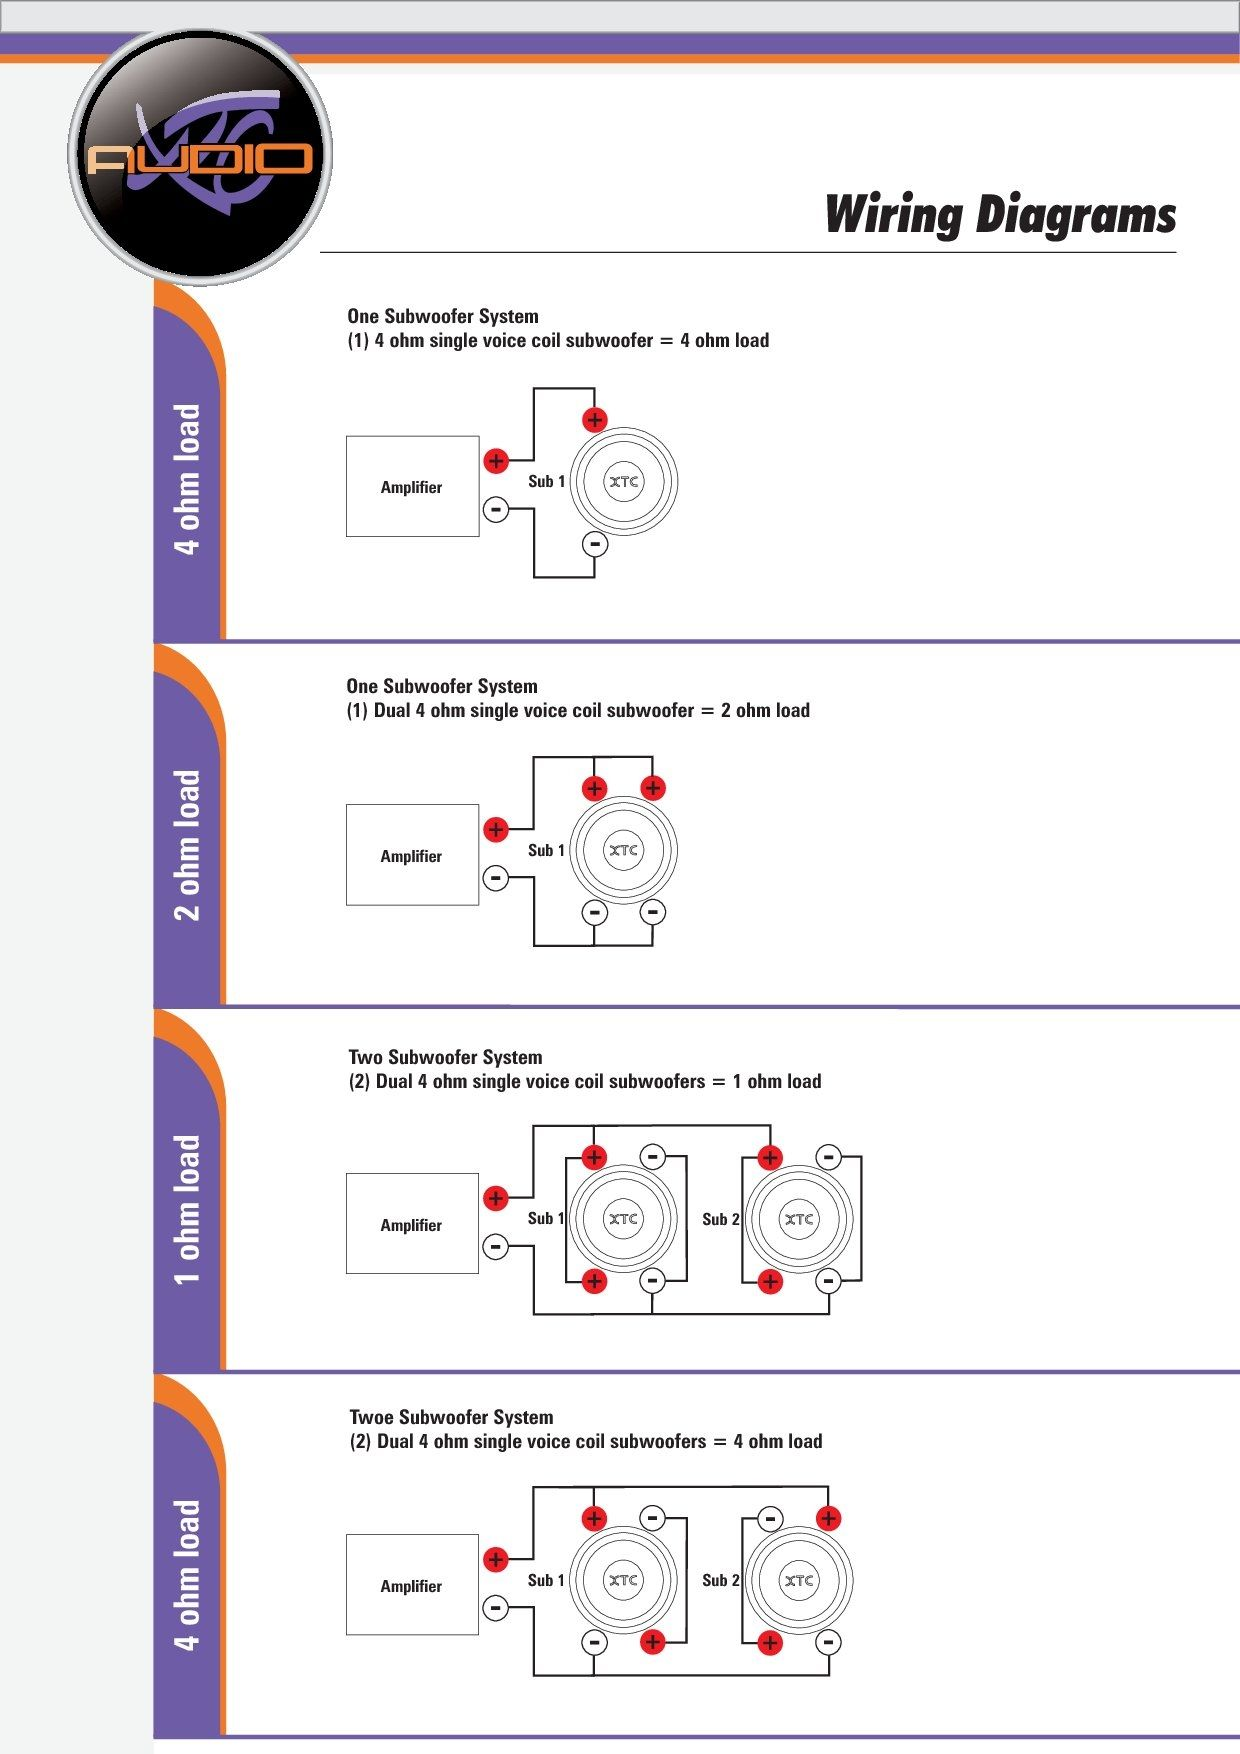 Single Subwoofer Wiring Diagram Preisvergleich With Regard To Audiobahn Subwoofer Wiring Diagram Audio De Automoviles Audio Coche Electricidad Y Electronica